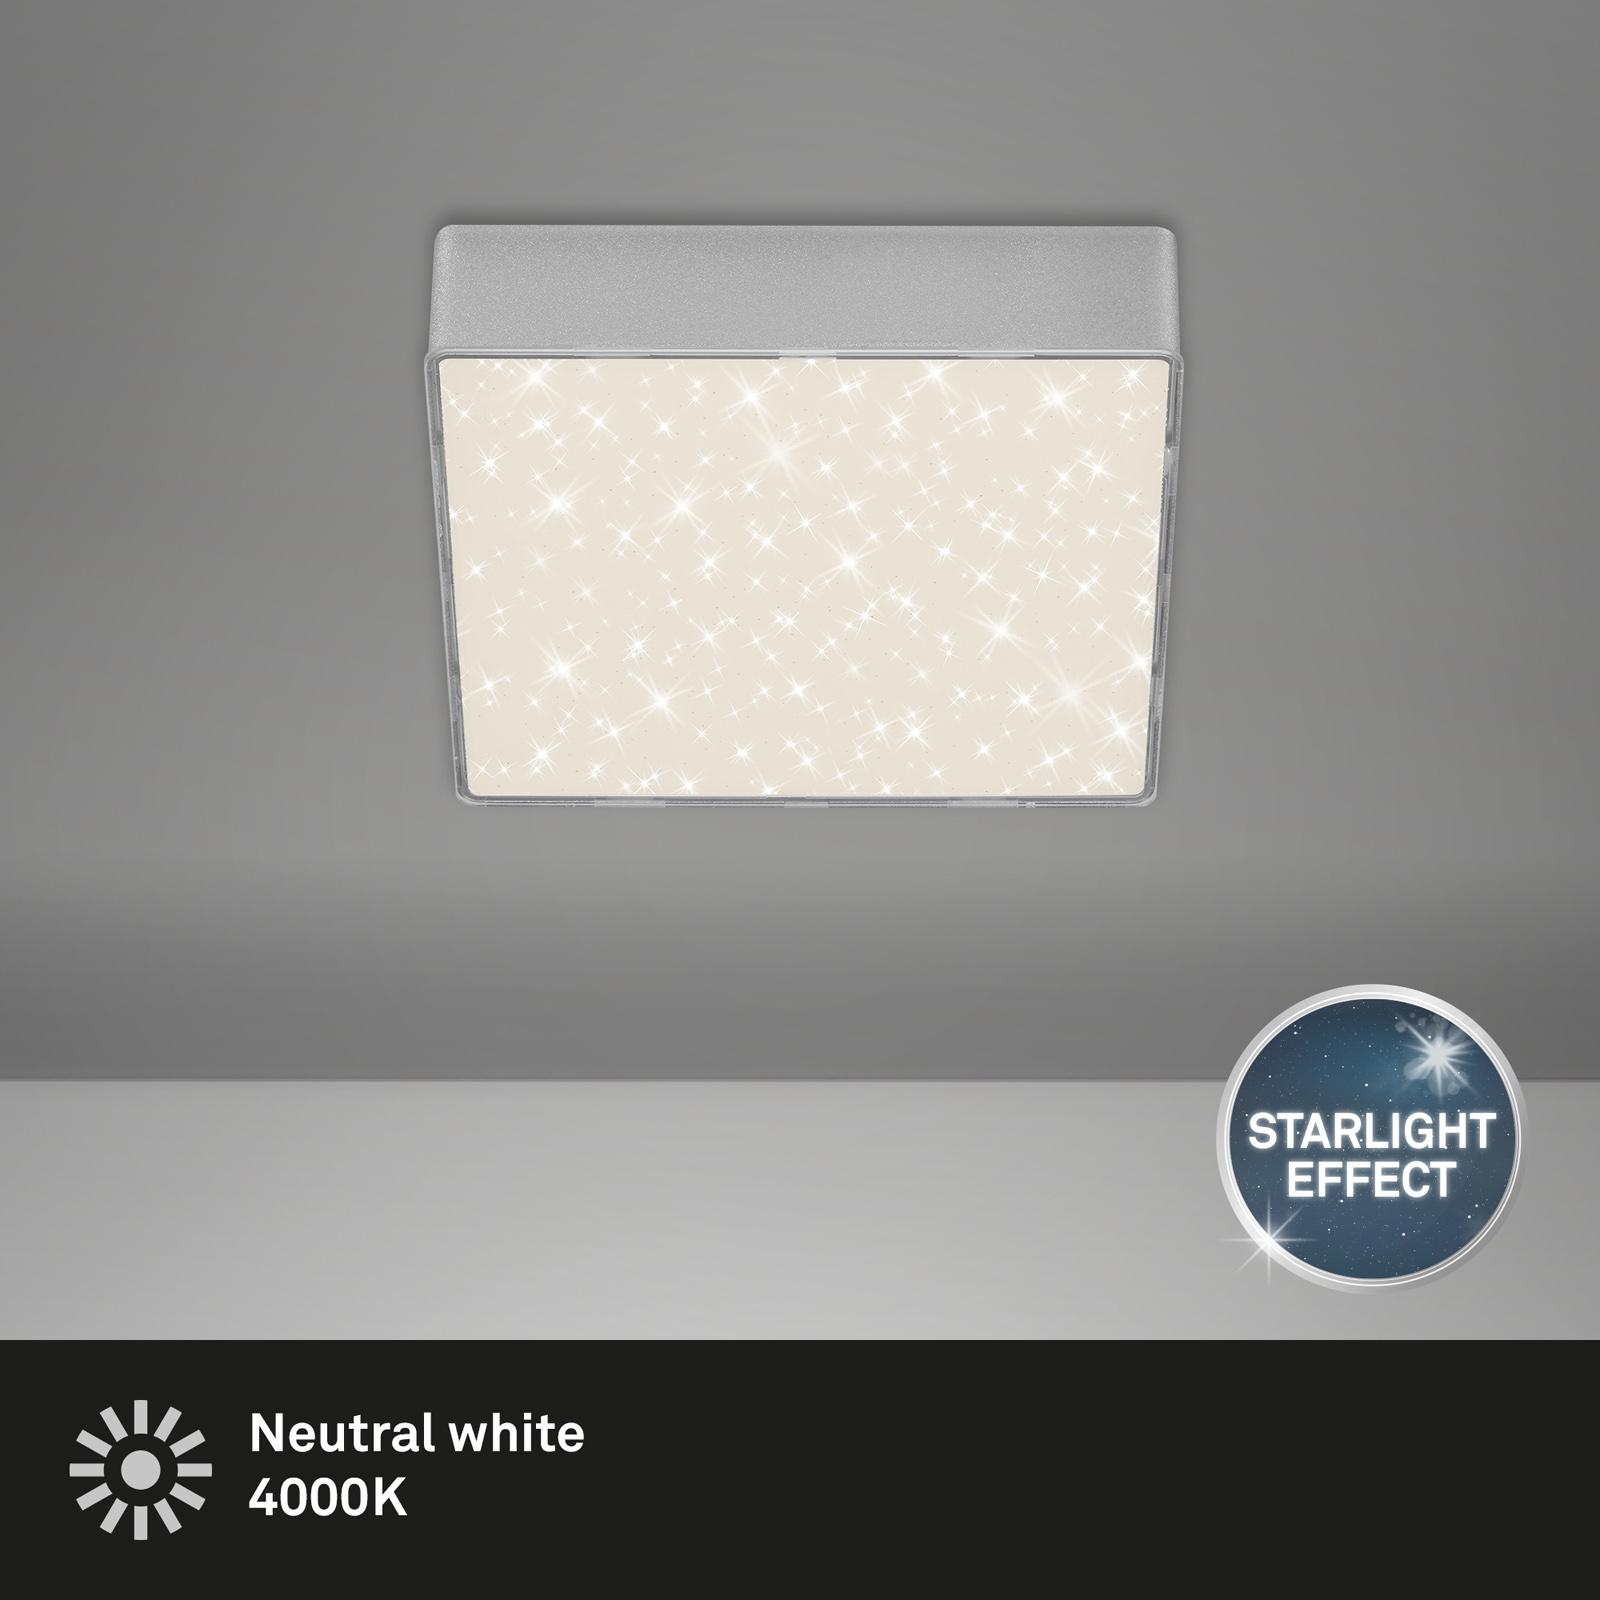 Sternenhimmel LED Deckenleuchte silber